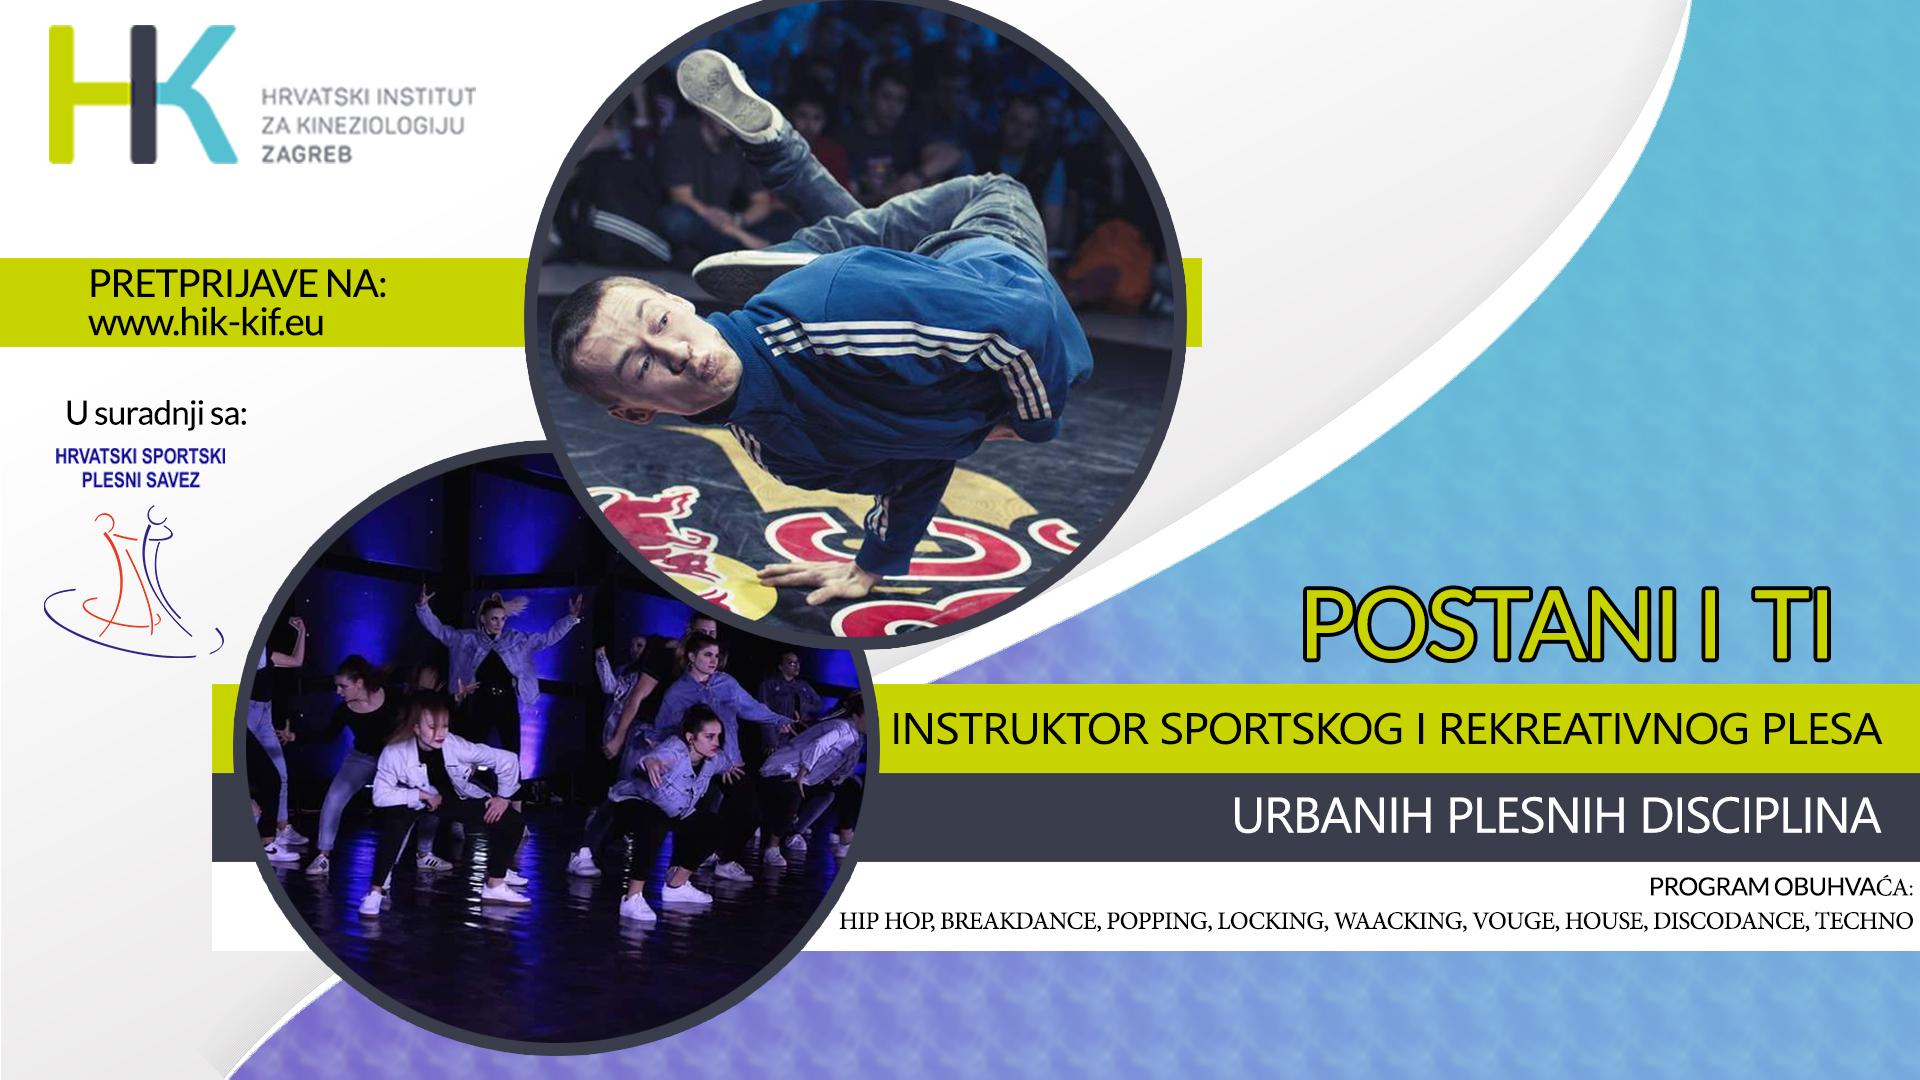 Urbane plesne discipline – stručno osposobljavanje pri Hrvatskom institutu za kineziologiju